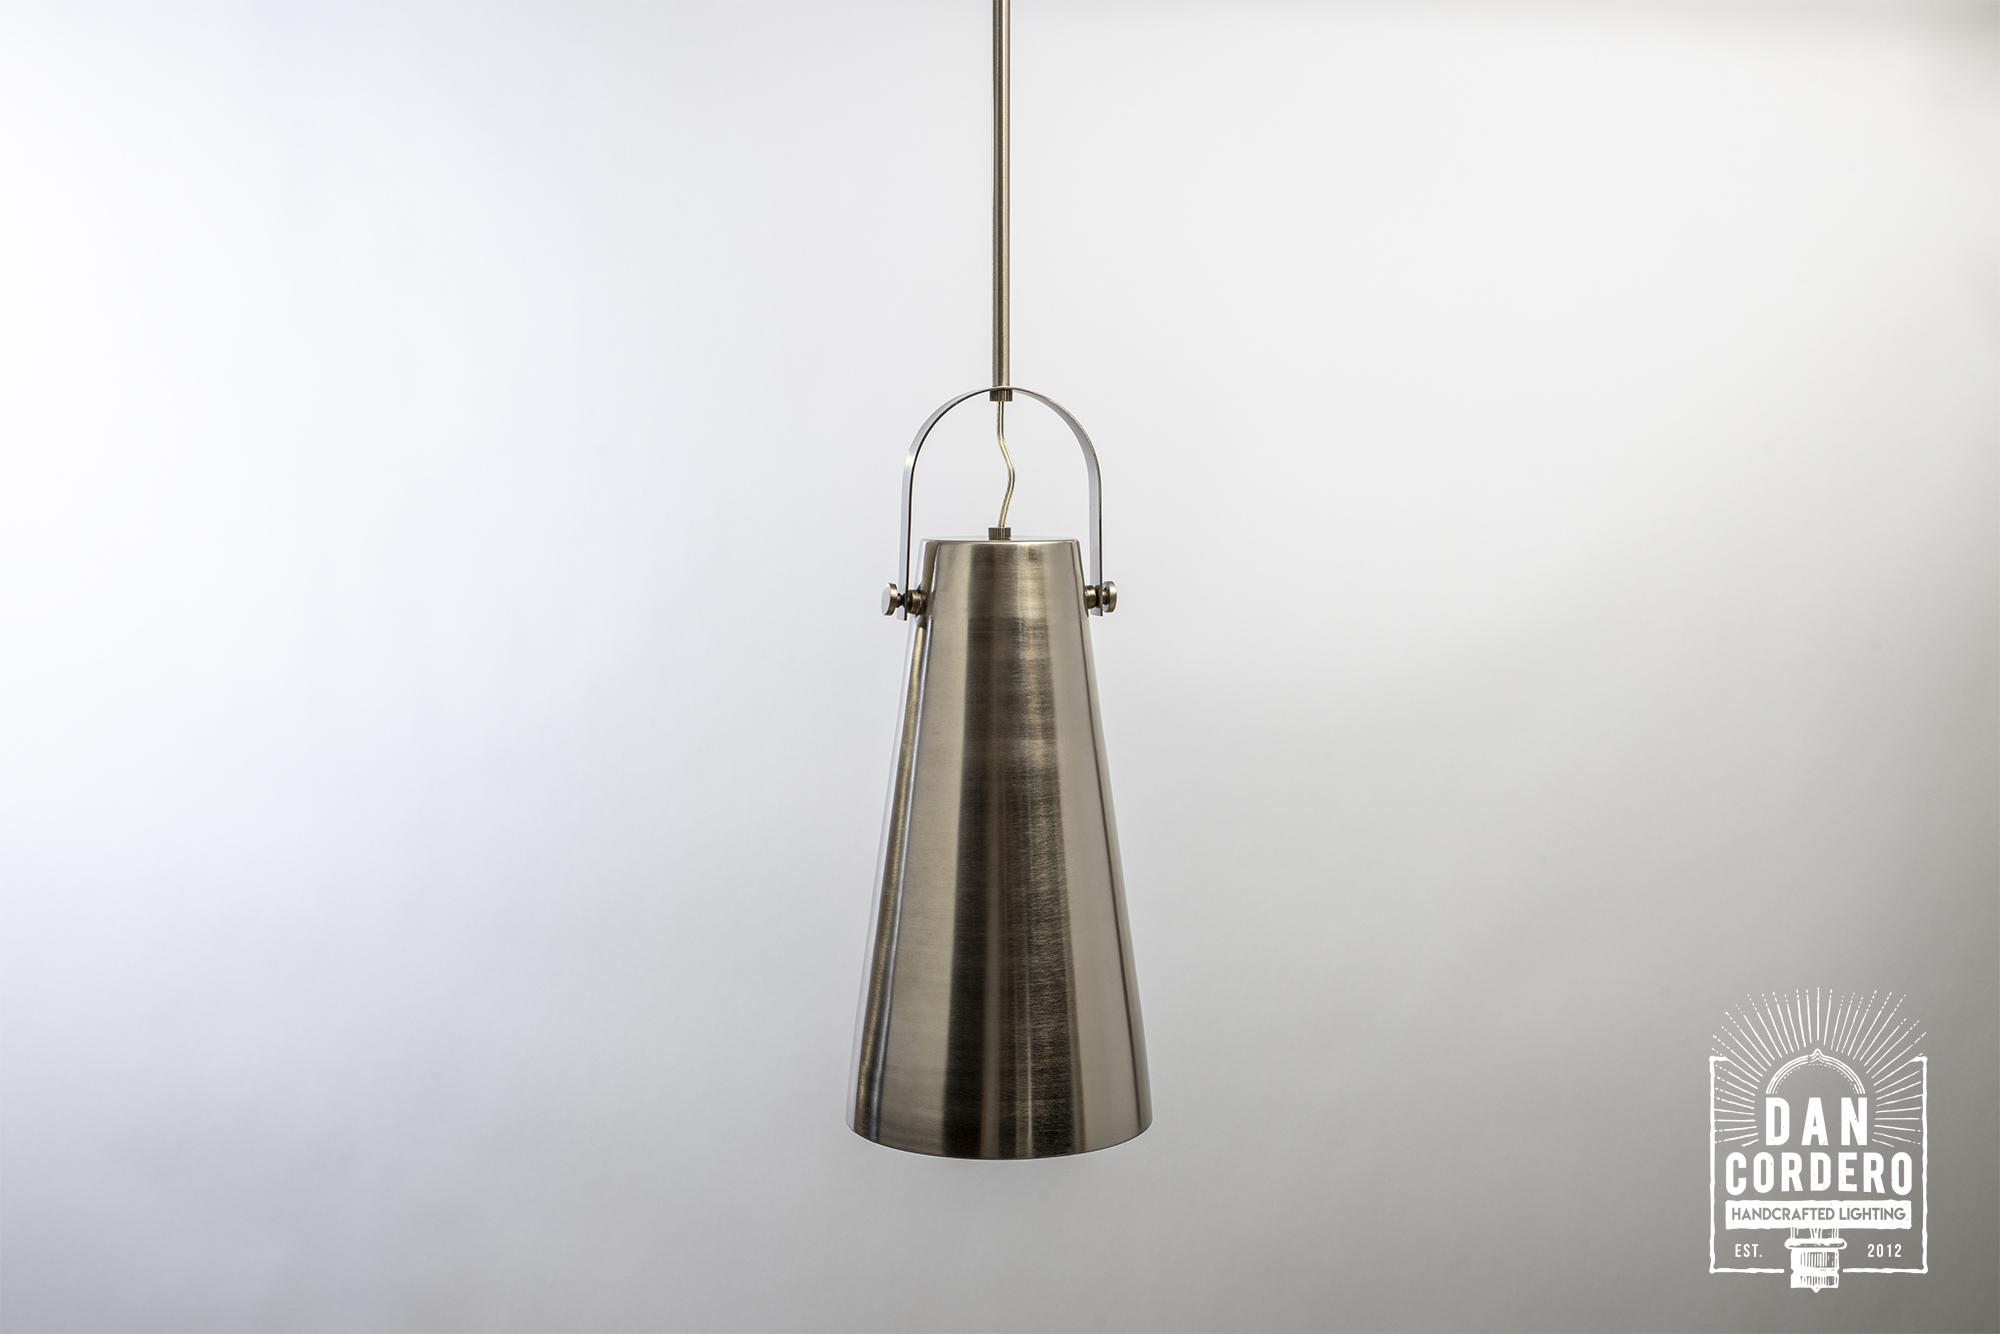 Rowan Dome Pendant Light Fixture